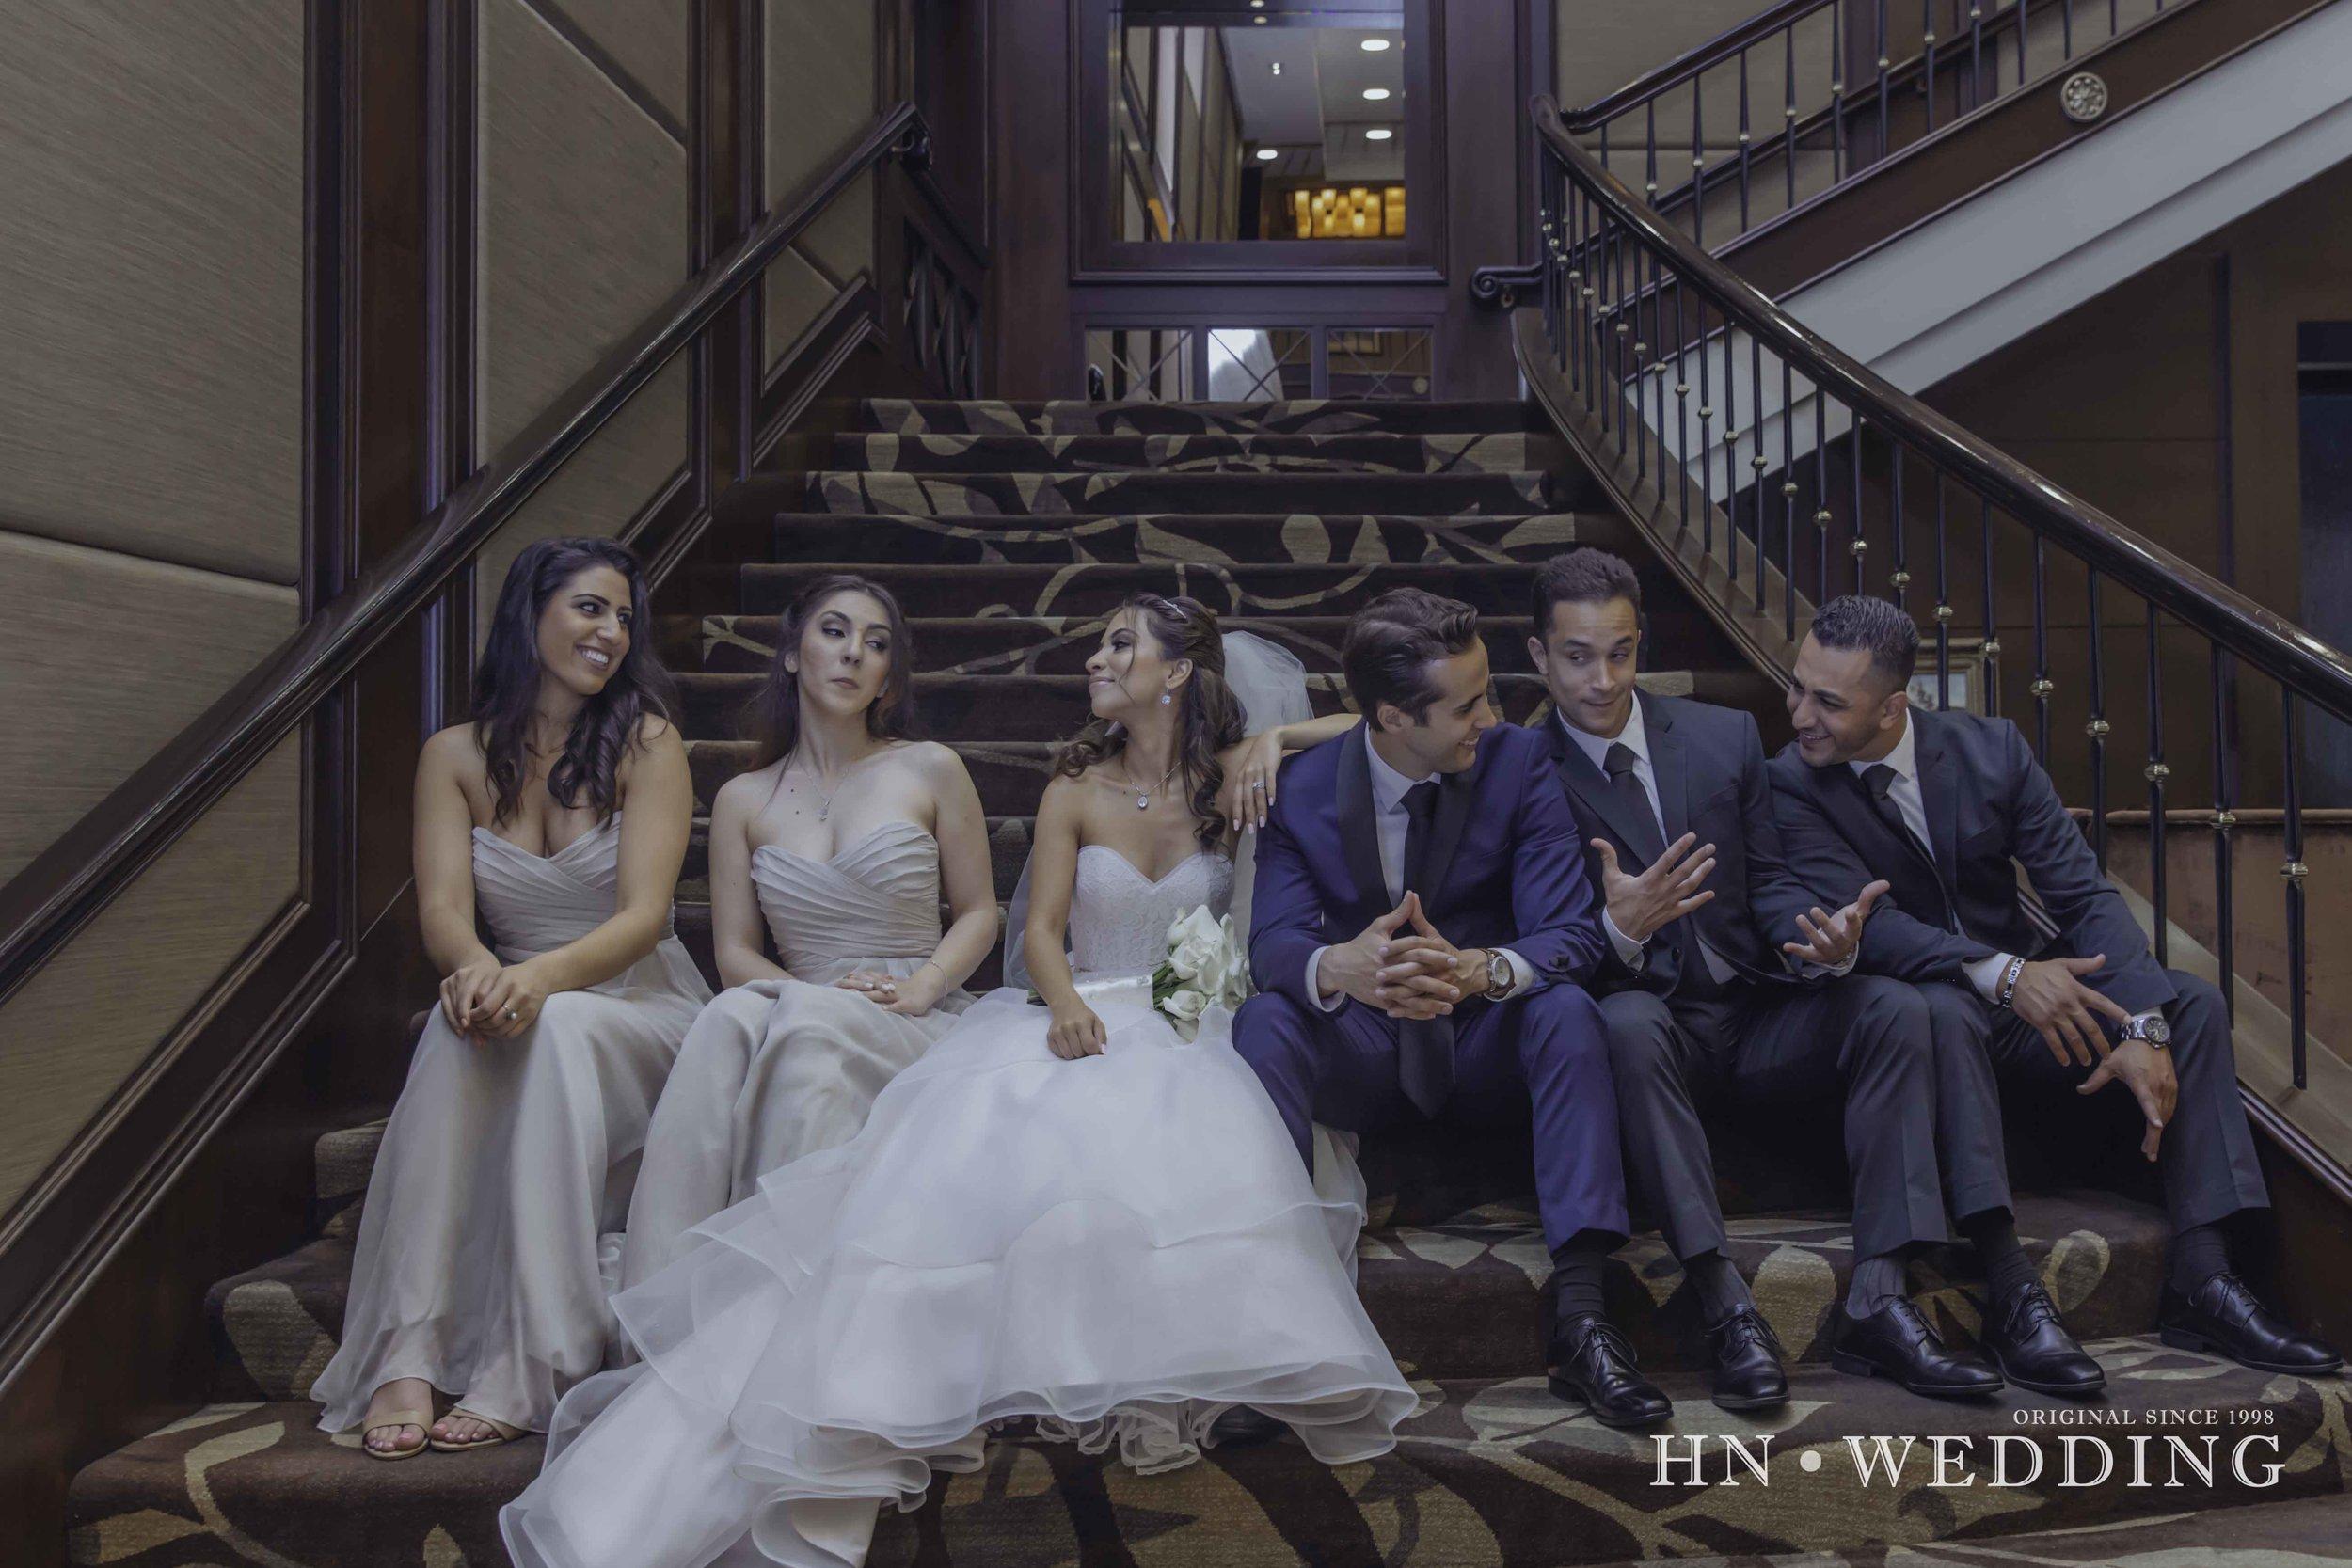 HNwedding-20161012-wedding-3915.jpg